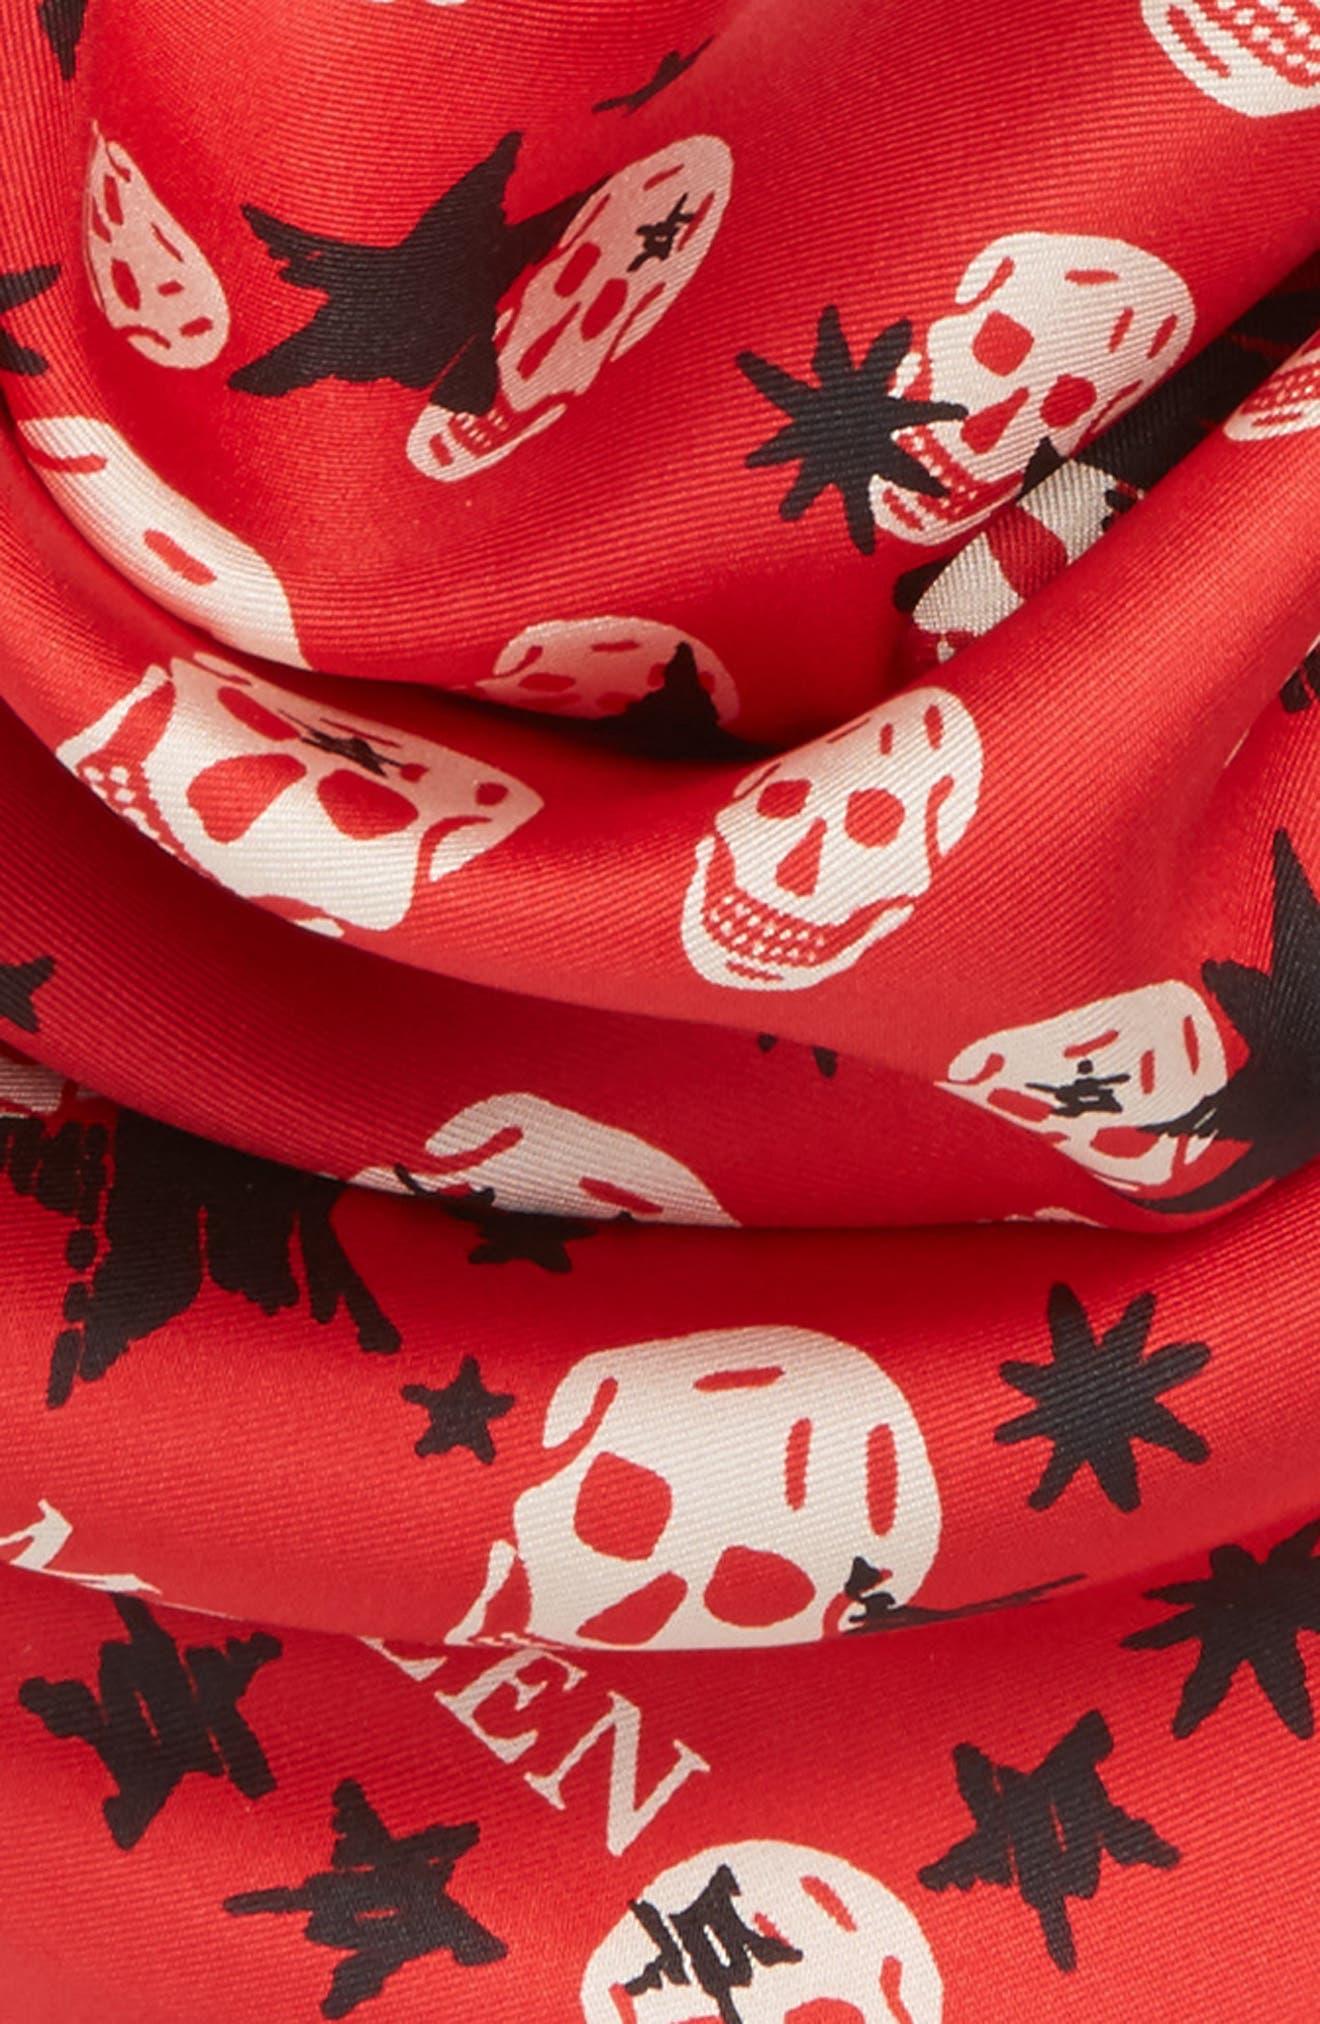 Starlight Skull Silk Bandana,                             Alternate thumbnail 3, color,                             Red/ Pink